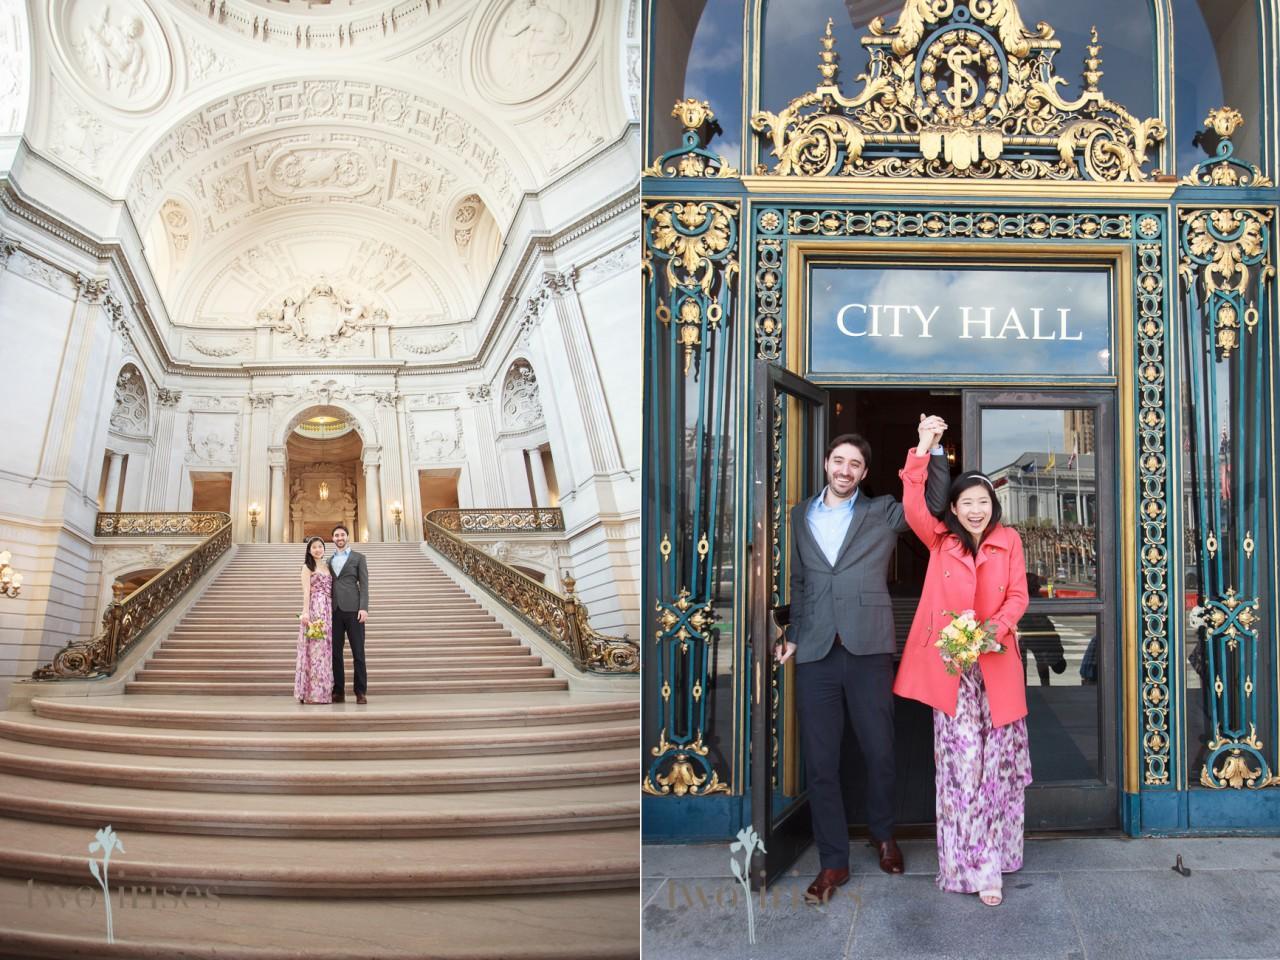 SF City Hall Wedding Photos by Two Irises